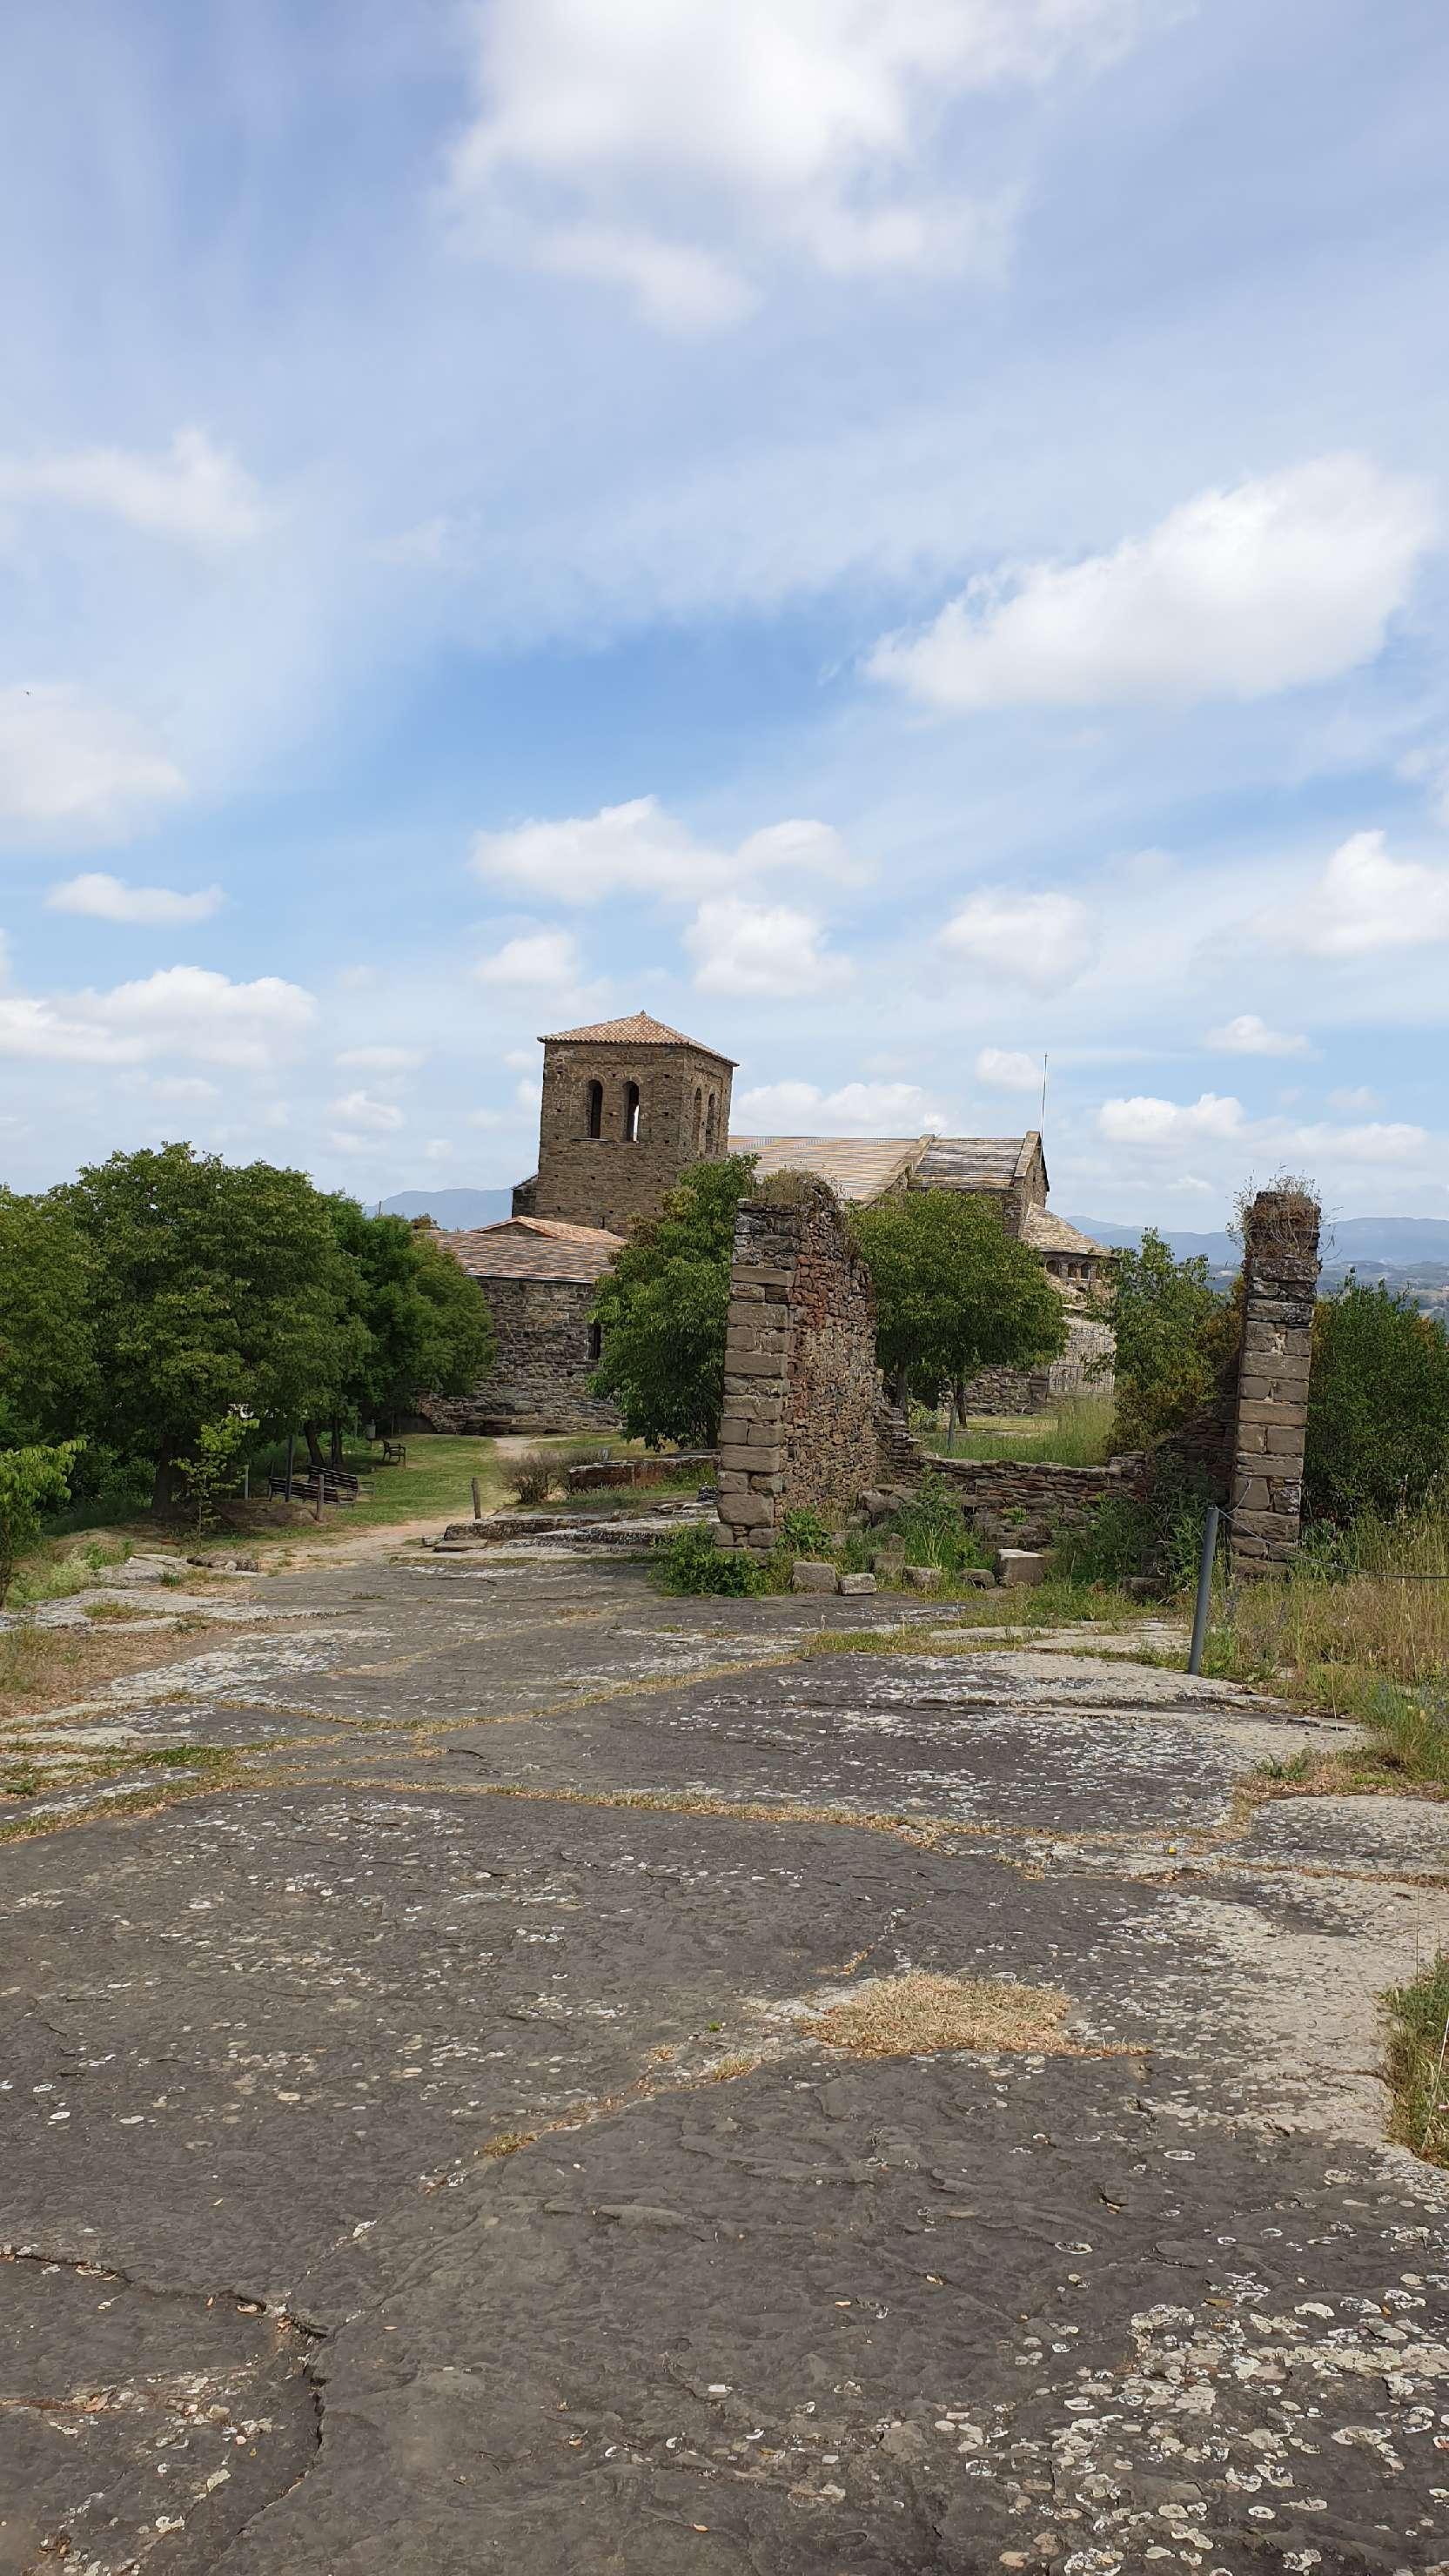 Monestir de Sant Pere de Casserres